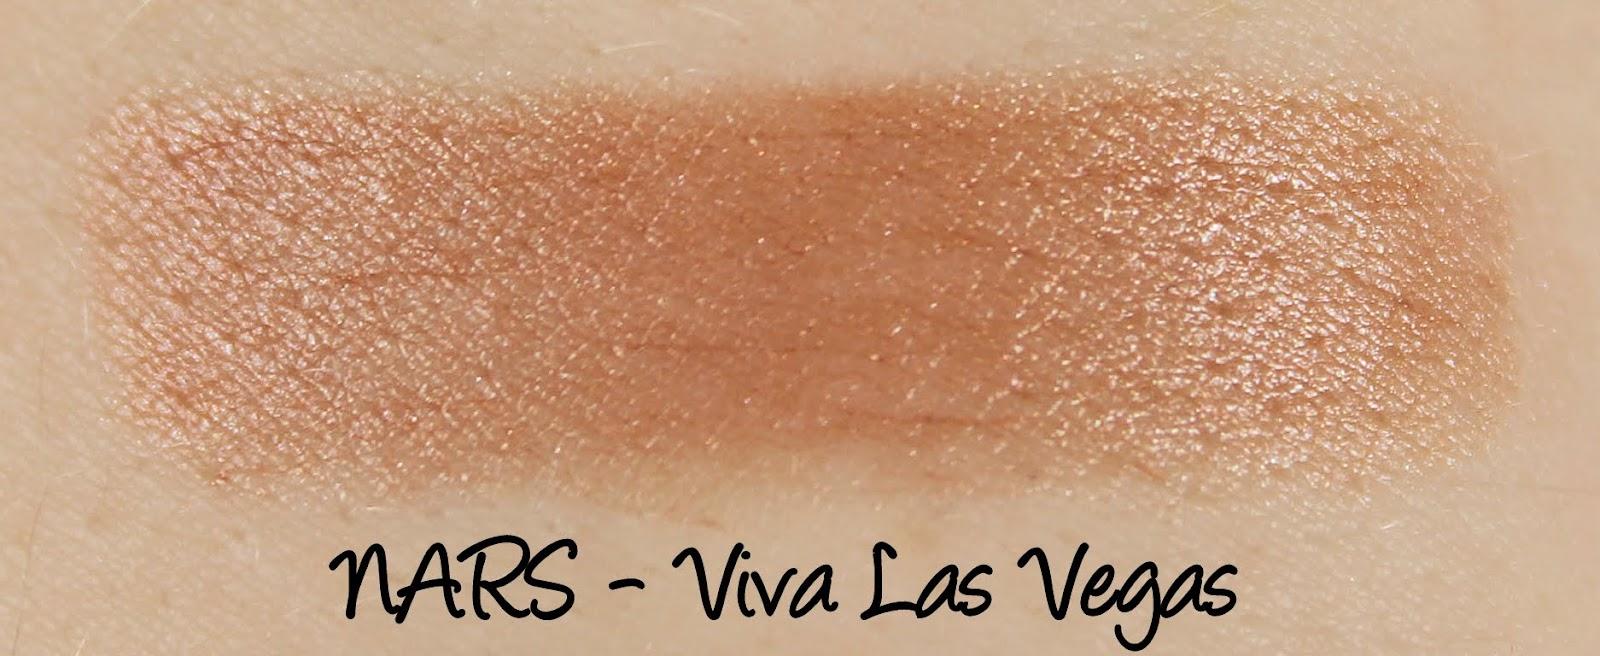 NARS Viva Las Vegas Lipstick Swatches & Review